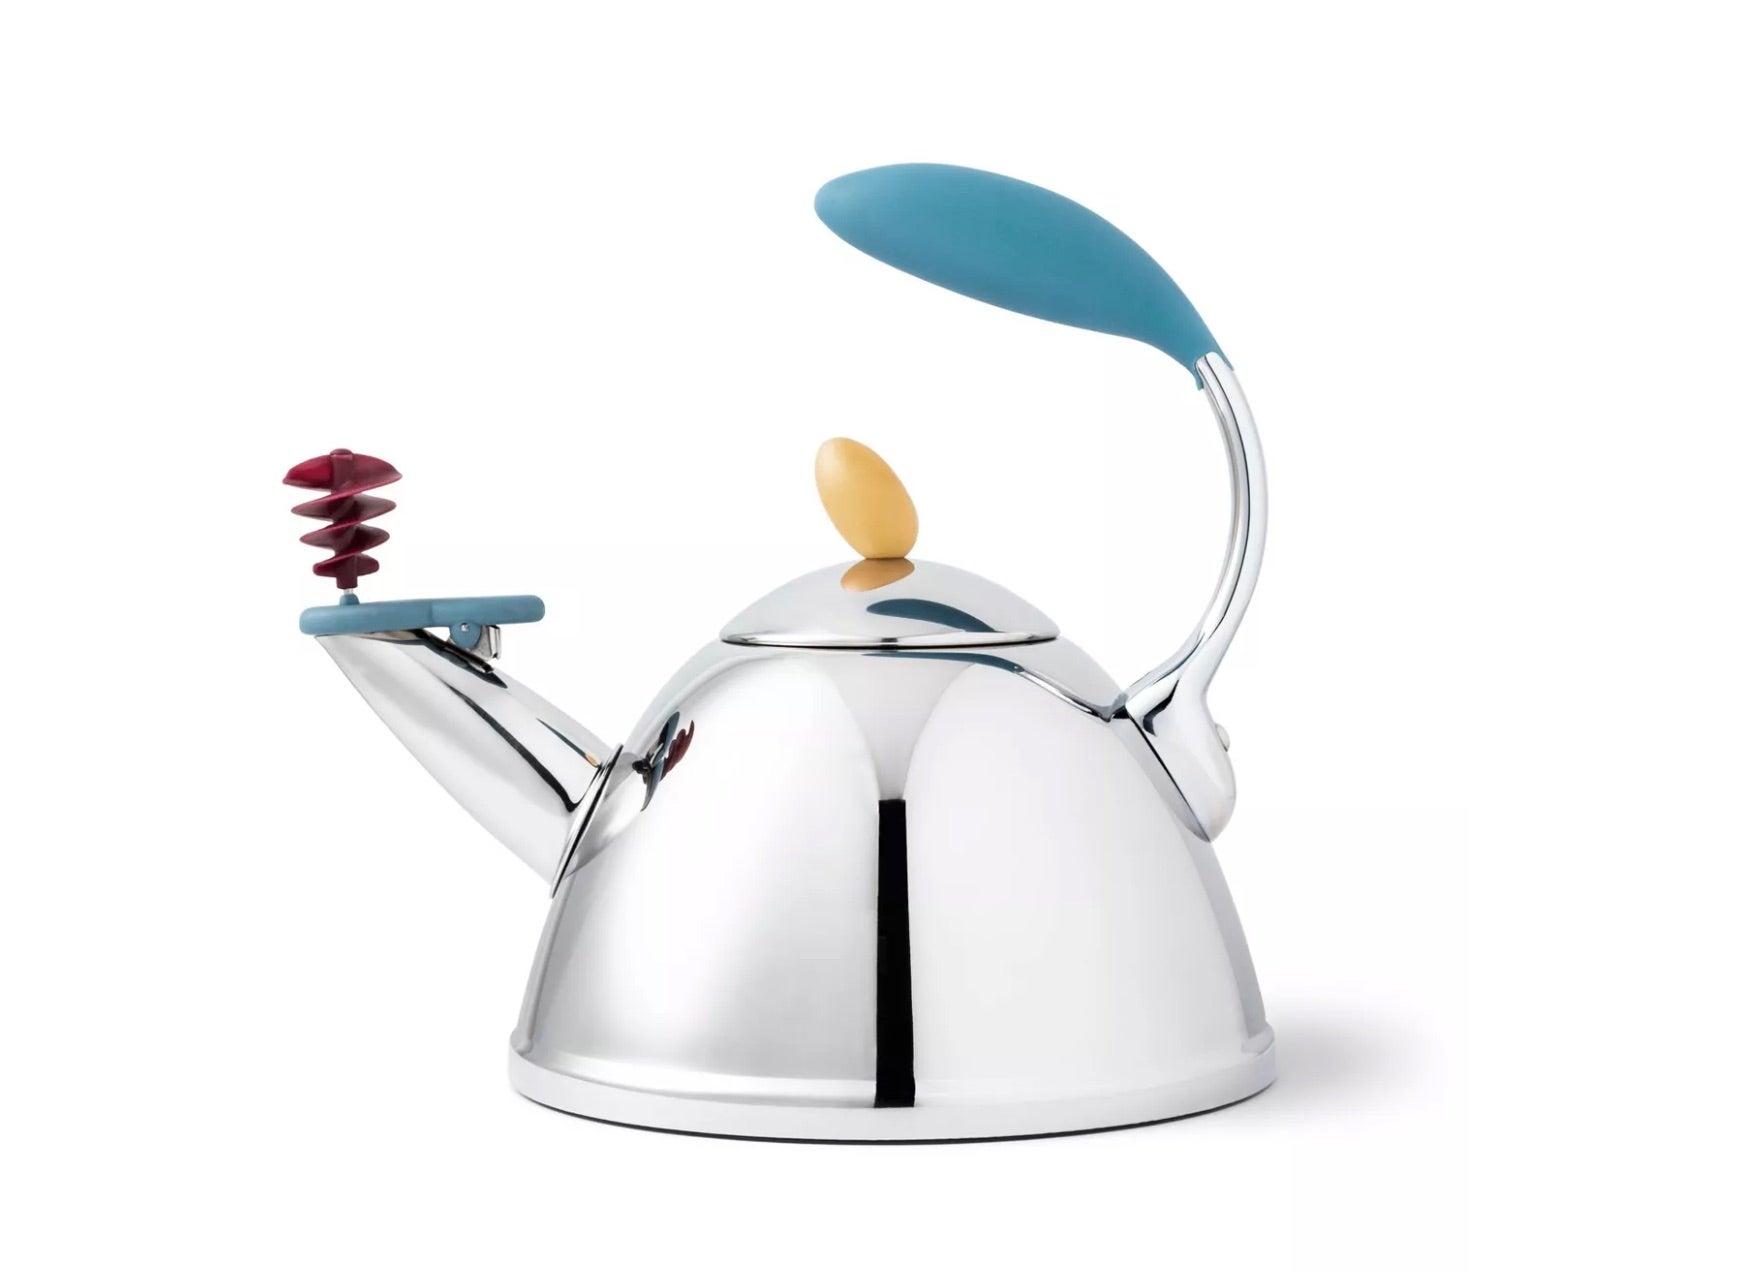 target-michael-graves-teapot